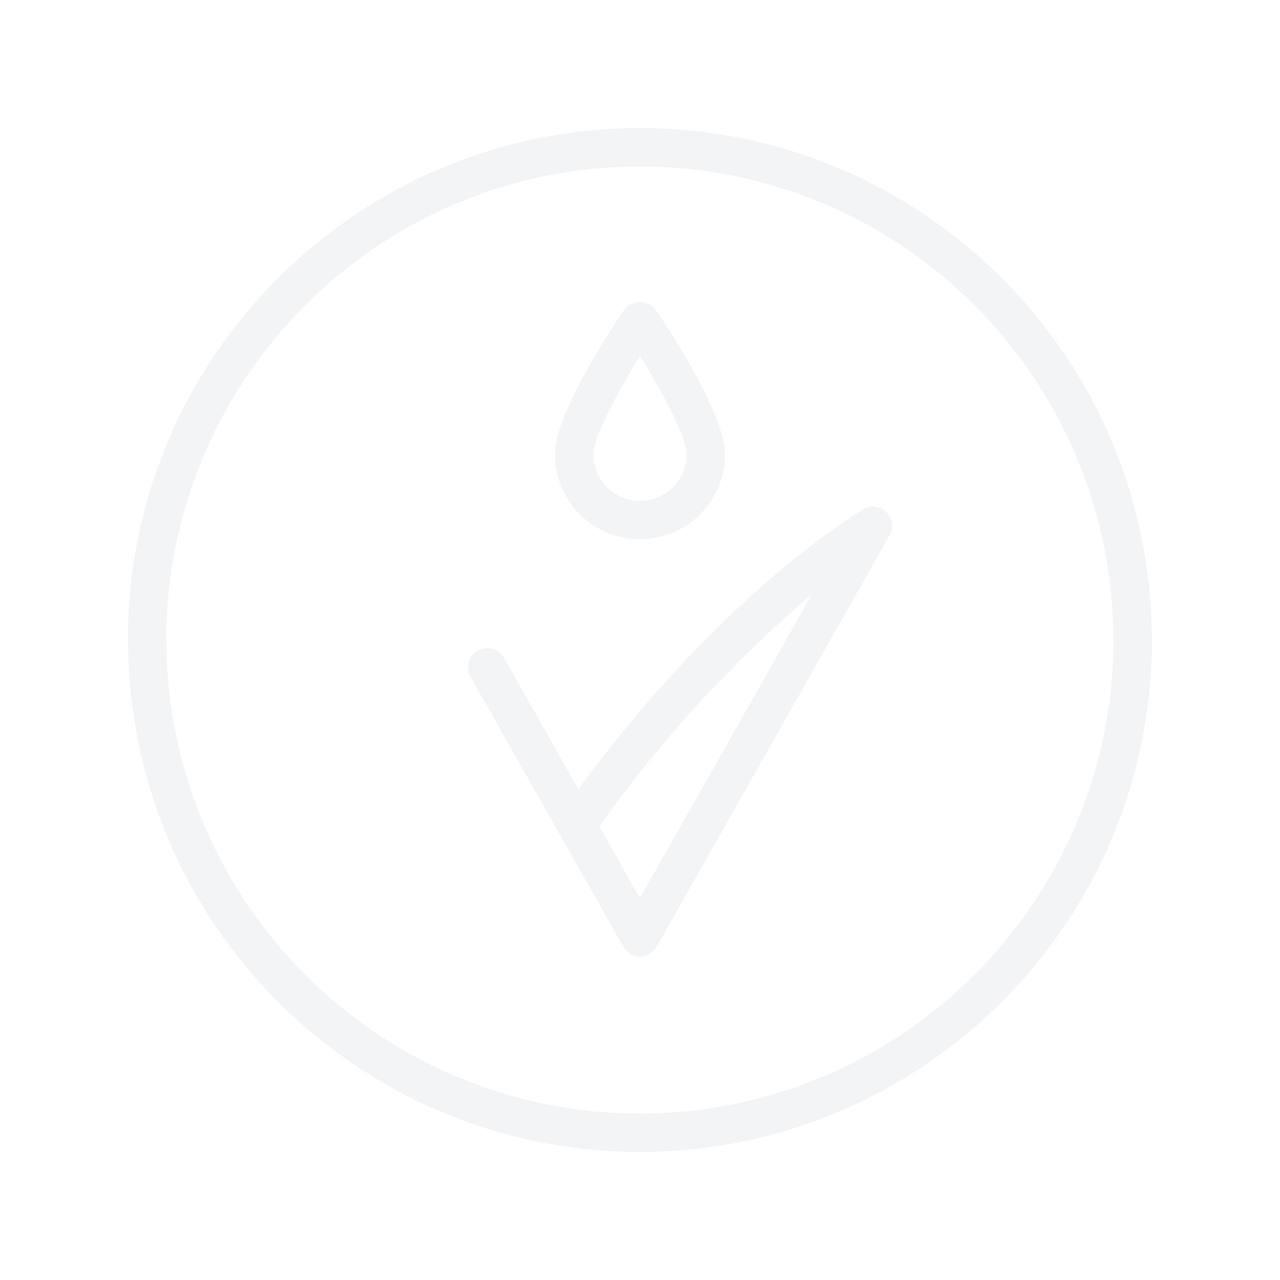 E.L.F. Intense Ink Eyeliner 1.6g